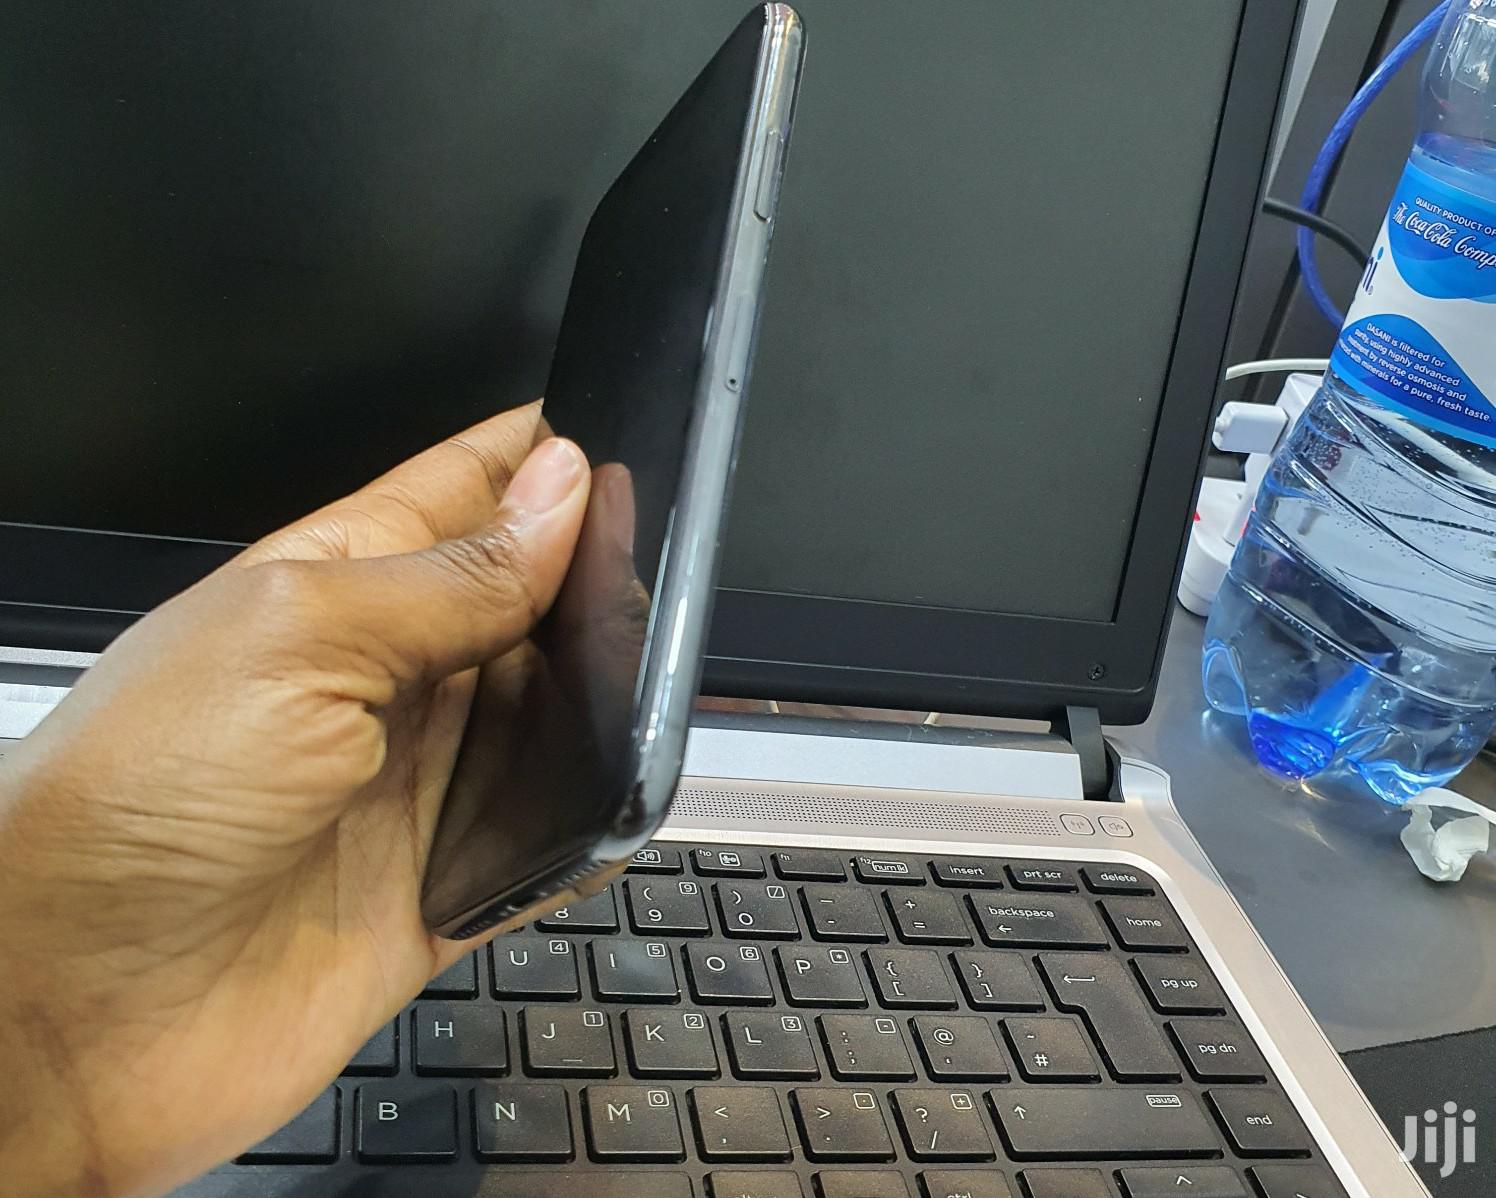 Apple iPhone X 256 GB   Mobile Phones for sale in Nairobi Central, Nairobi, Kenya